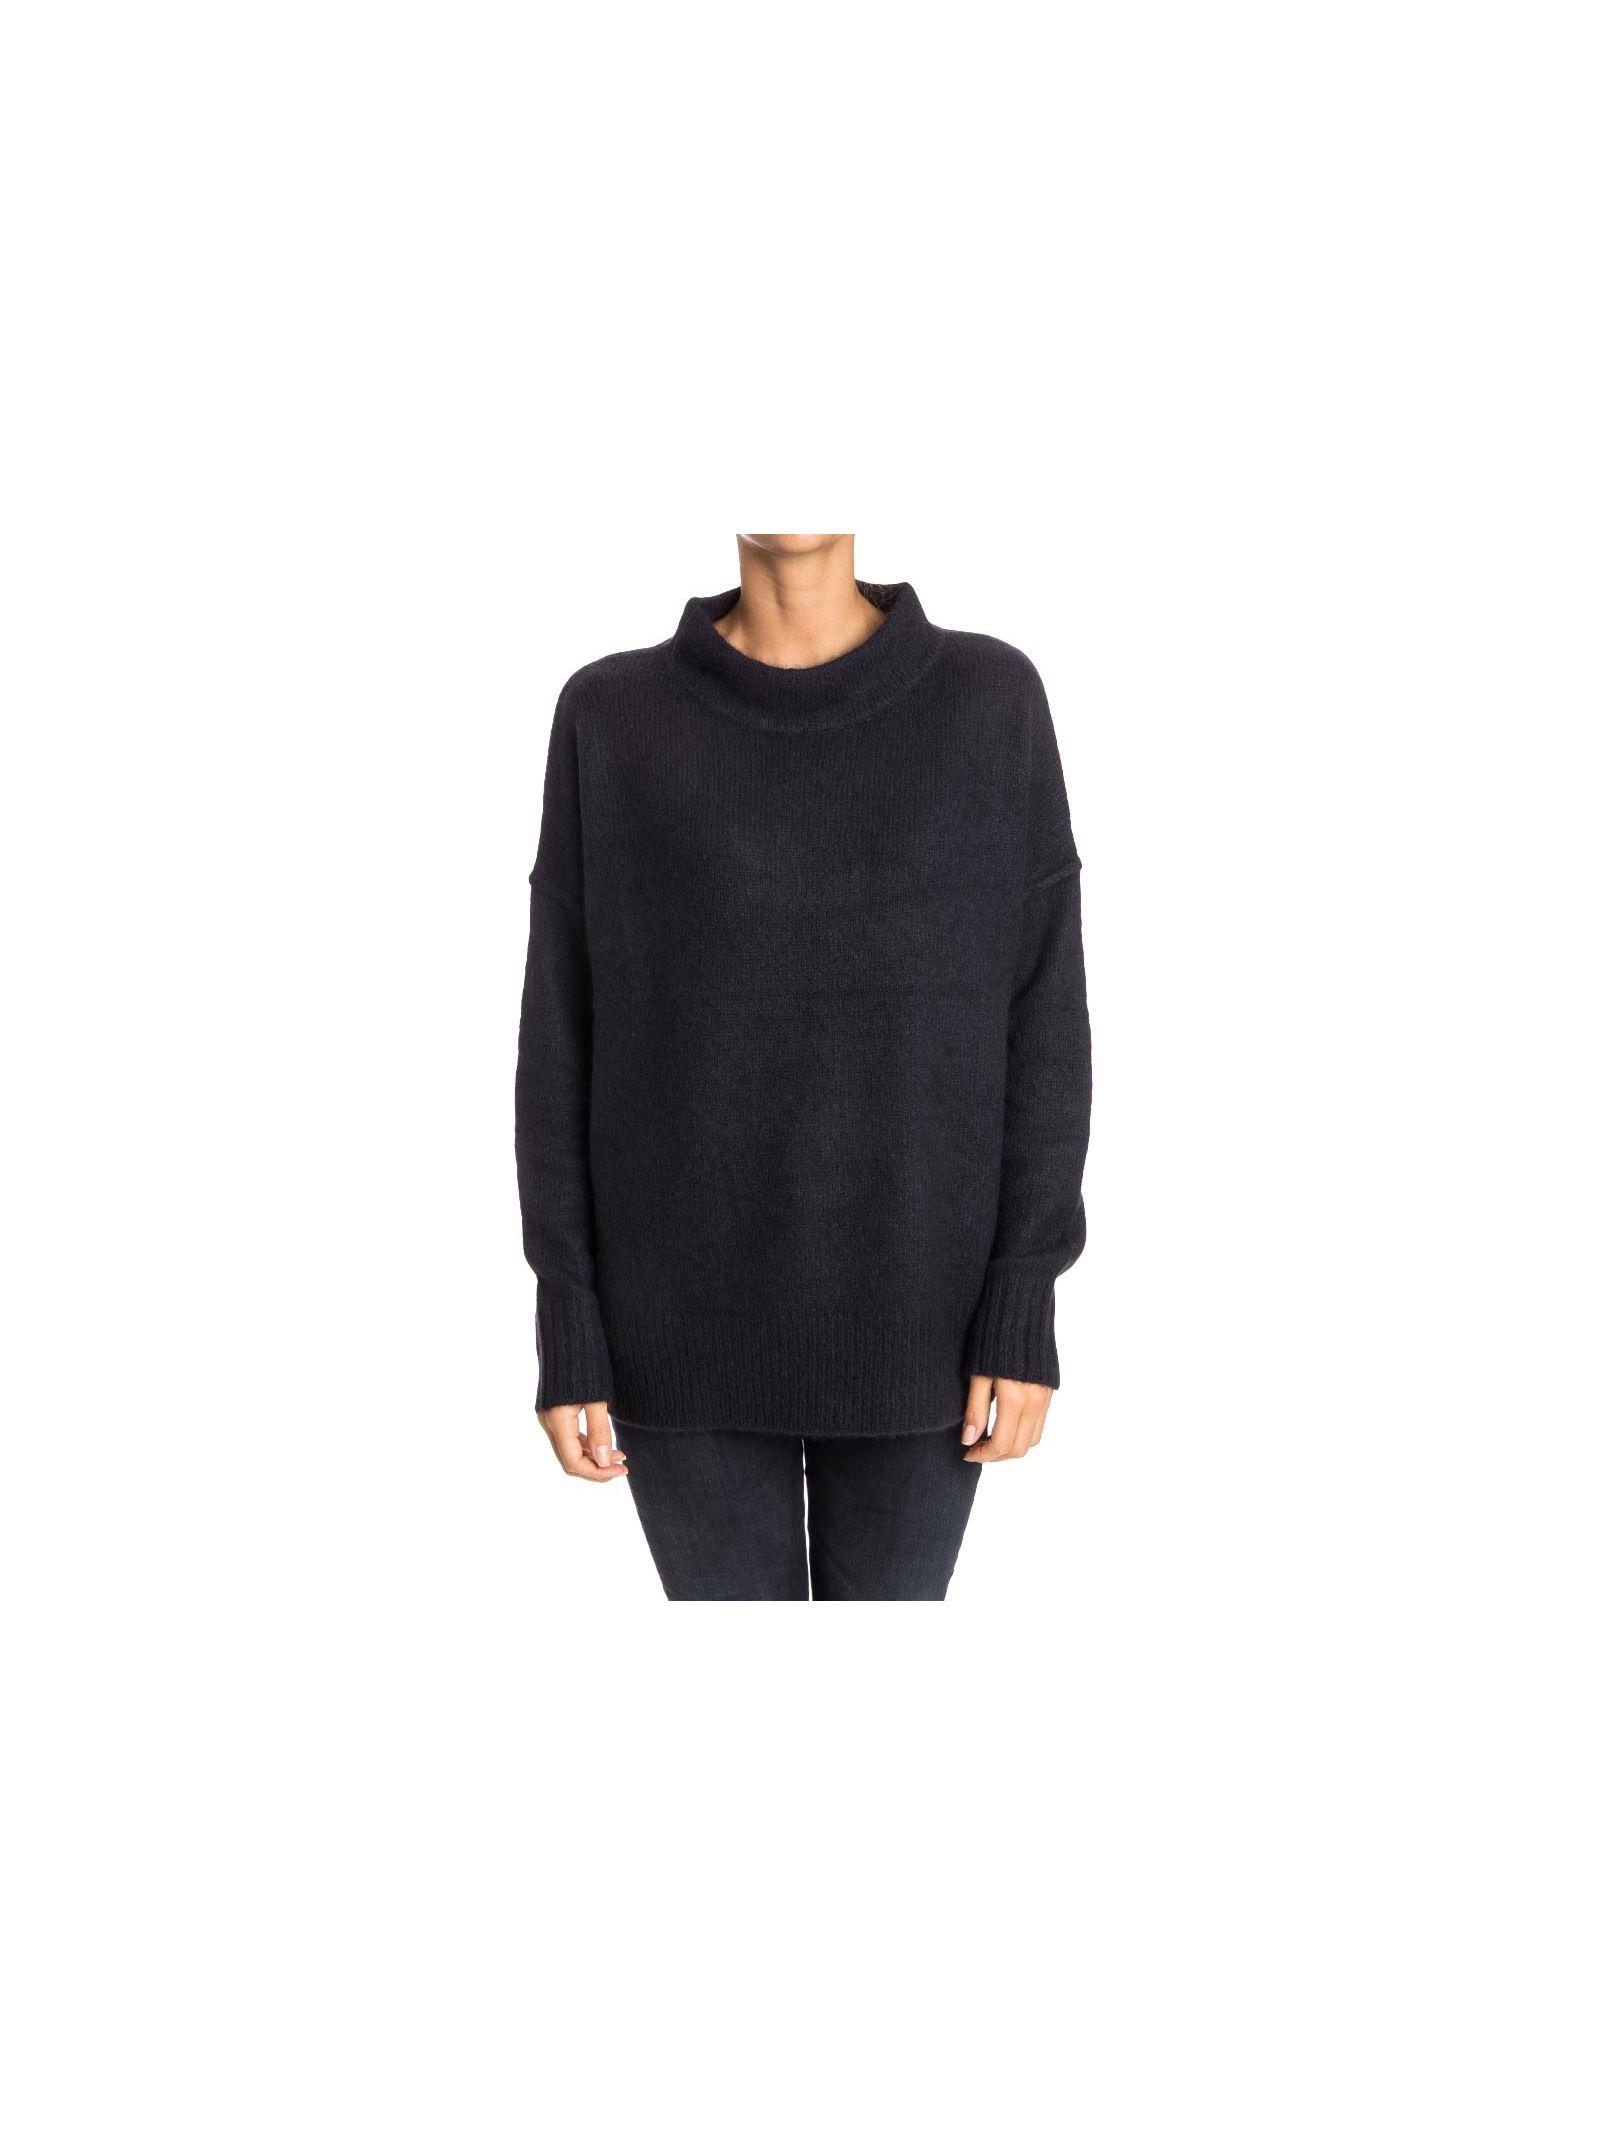 360 Cashmere - Cachemire Sweater - Kirby